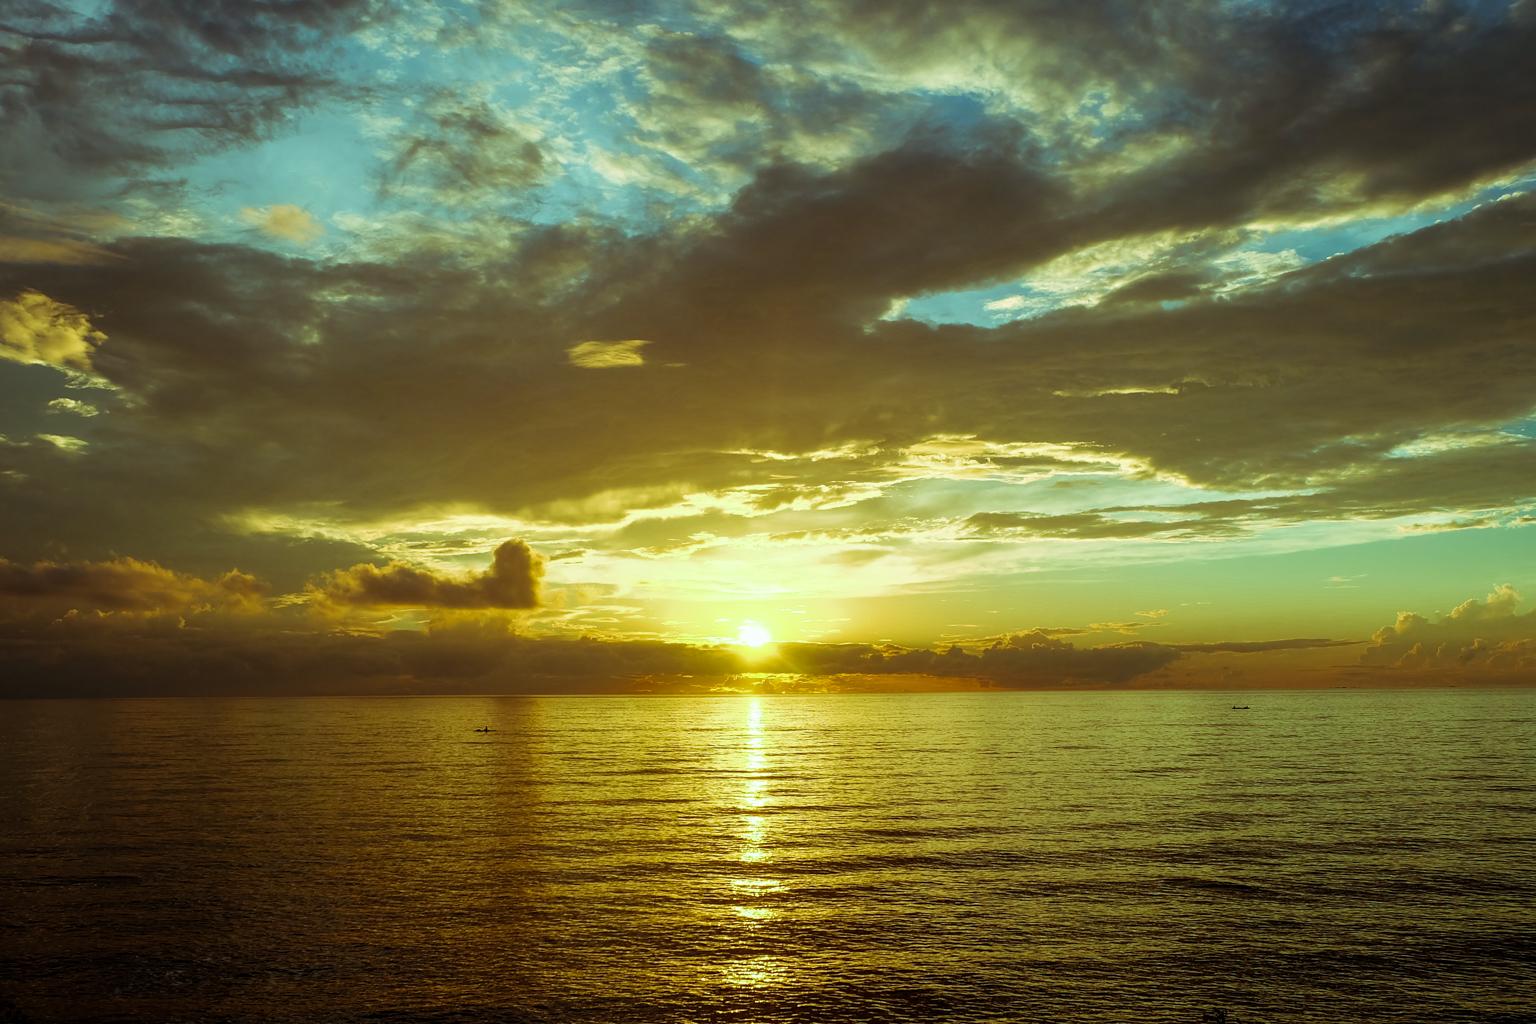 sunrise-at-bagacay-point-lighthouse-liloan-cebu-3